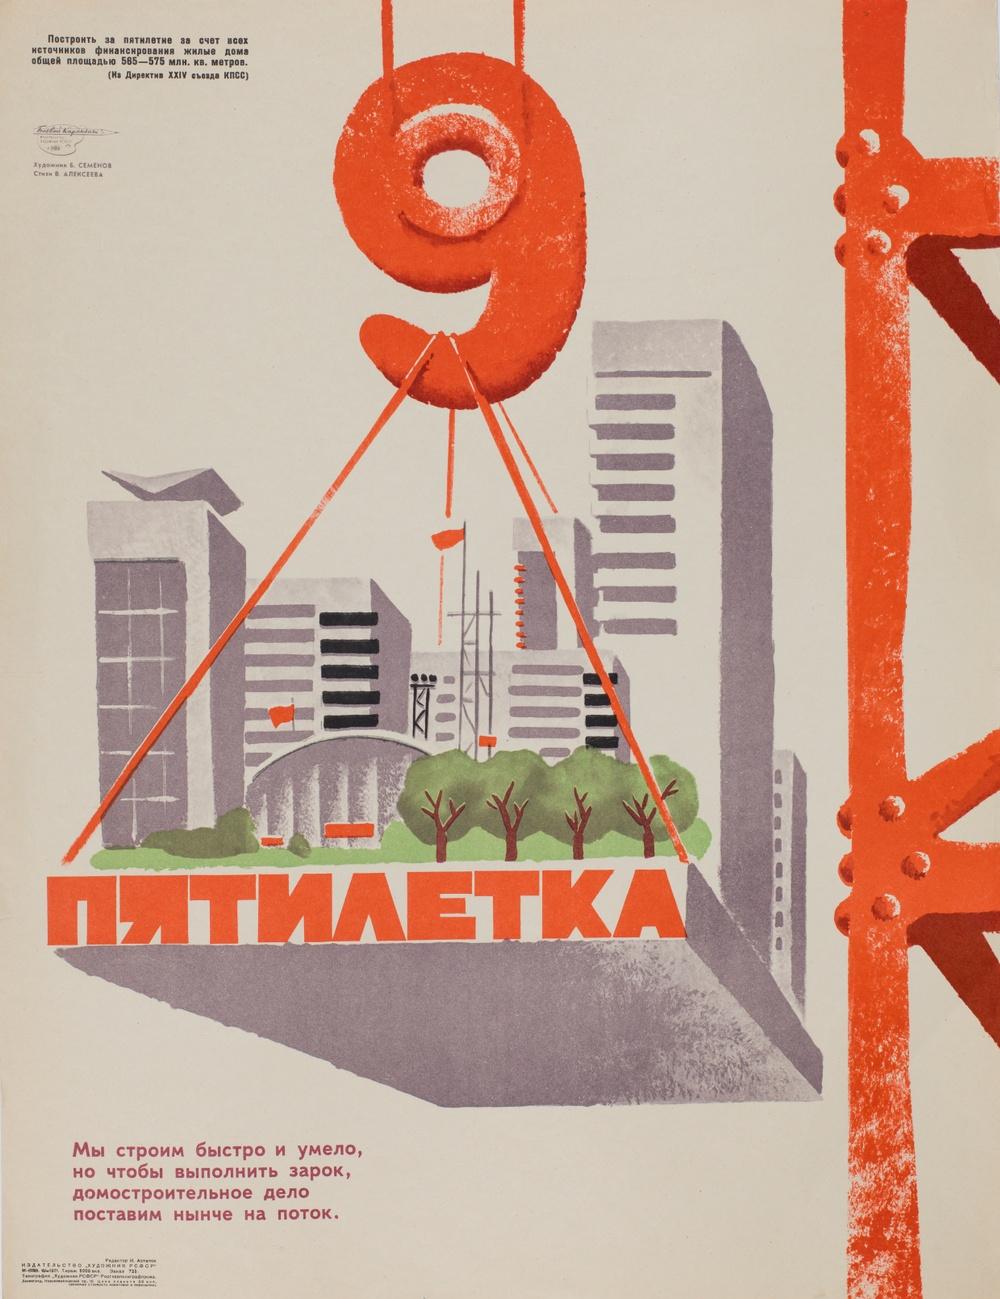 9th Five-year. B. Semyonov och V. Aleksejev. Affisch, Sovjetunionen. M. Gordo.